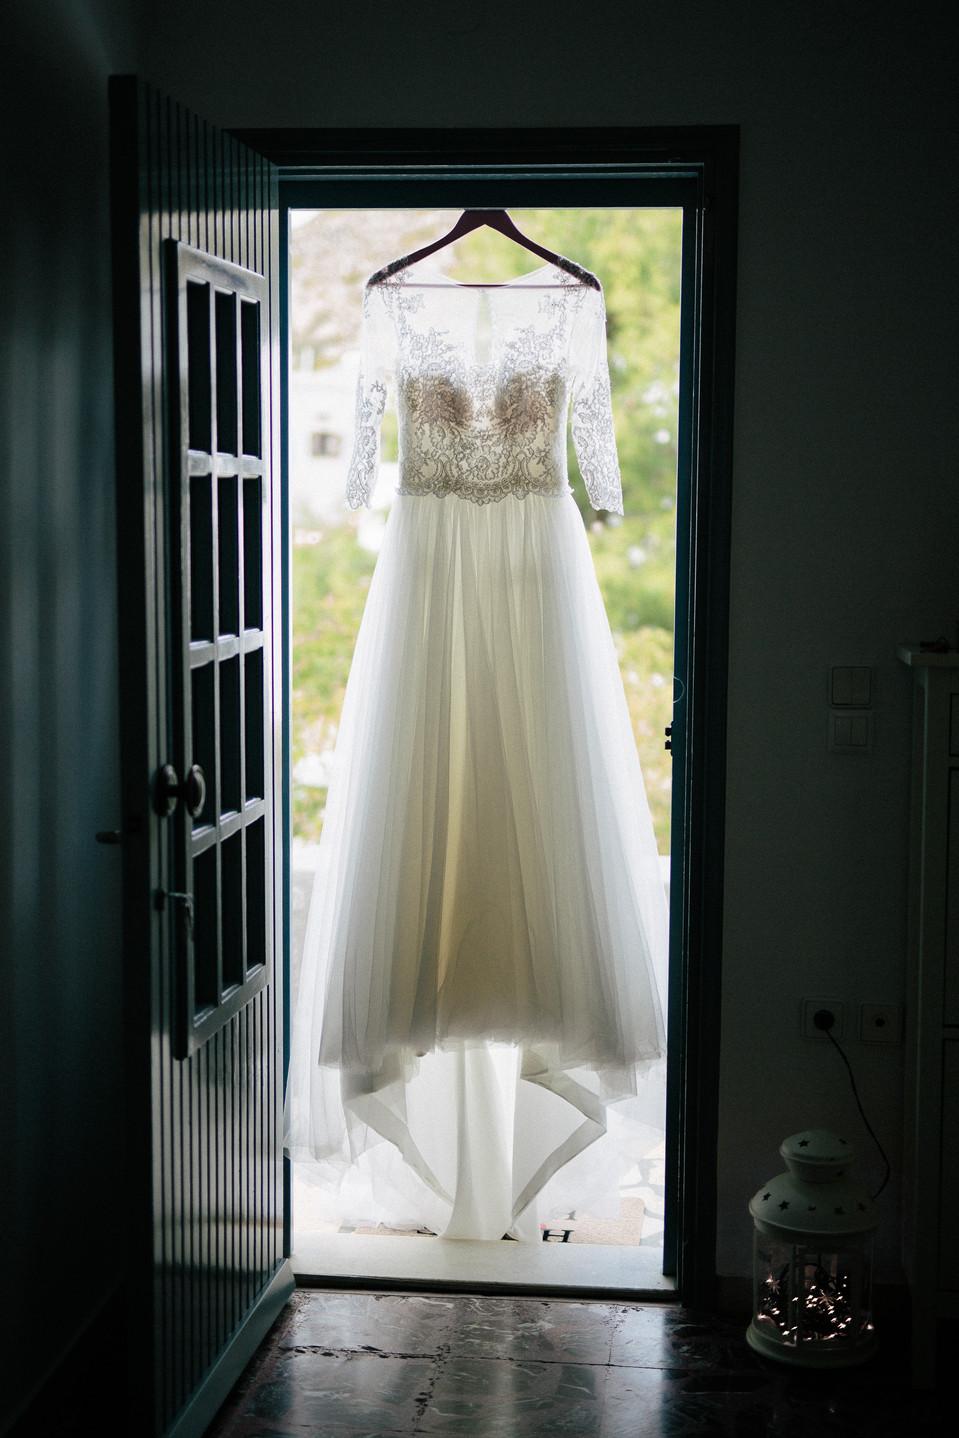 Wedding photographer Constantinos Pournaras Θεσσαλονίκη Βέροια Πάτμος